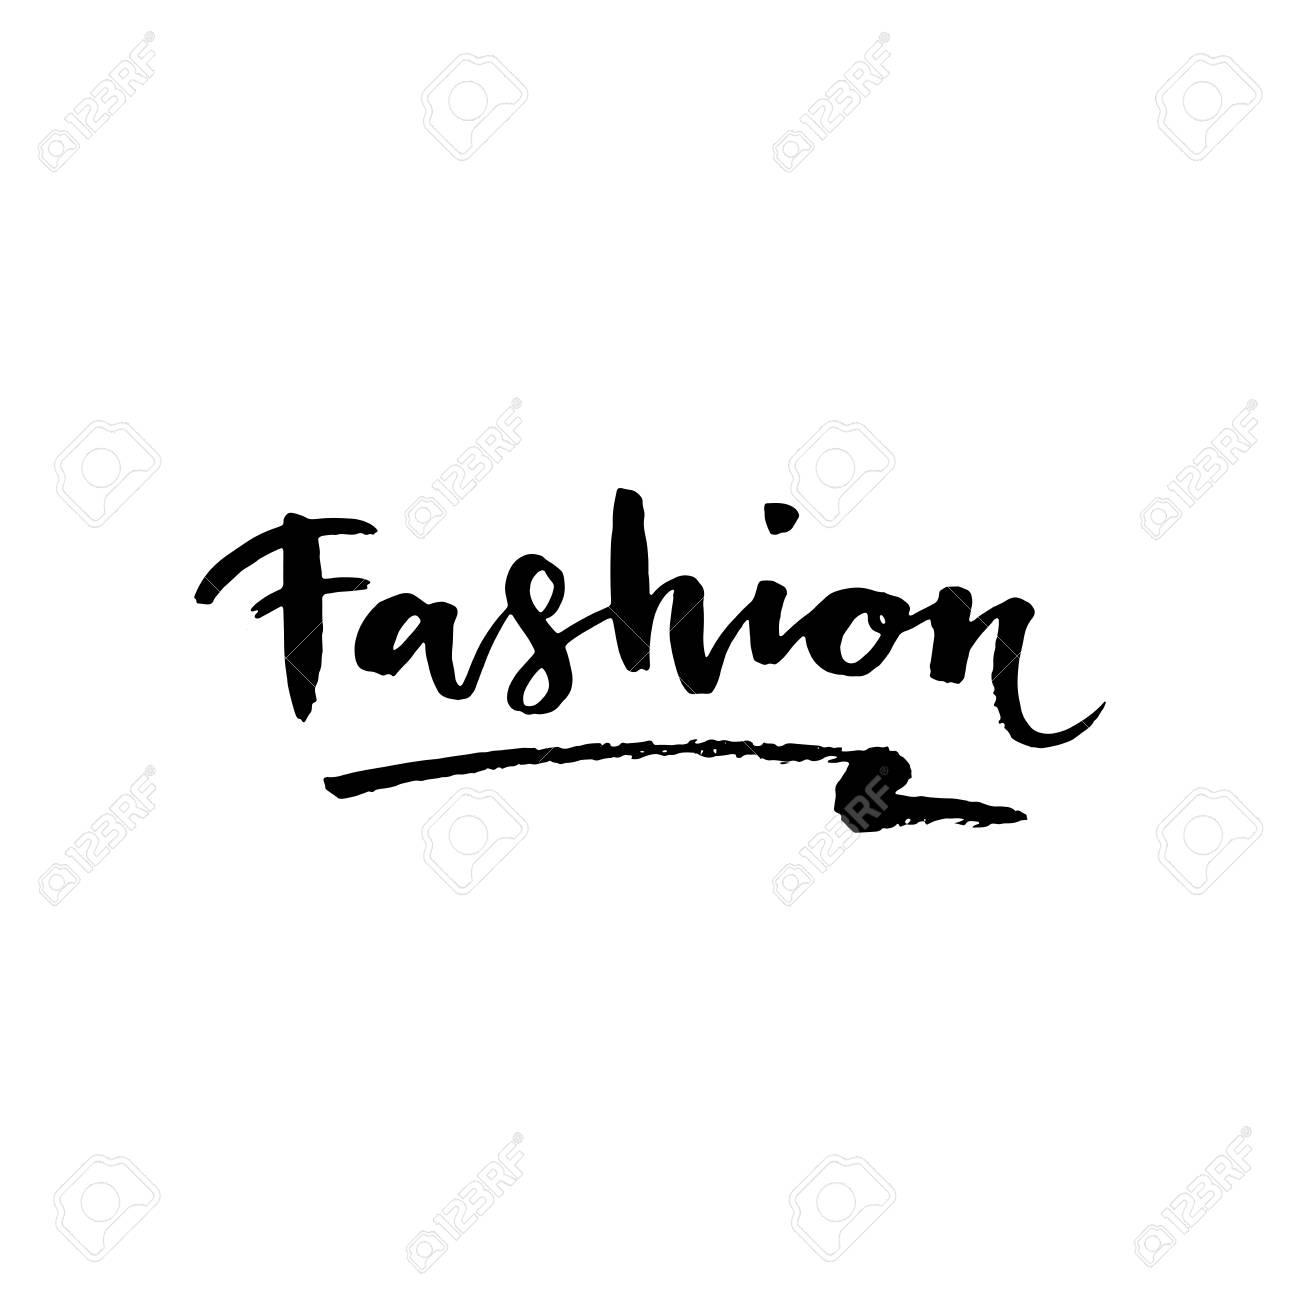 Fashion lettering brush stroke vector sketch cosmetic quote fashion lettering brush stroke vector sketch cosmetic quote modern brush lettering can be altavistaventures Choice Image